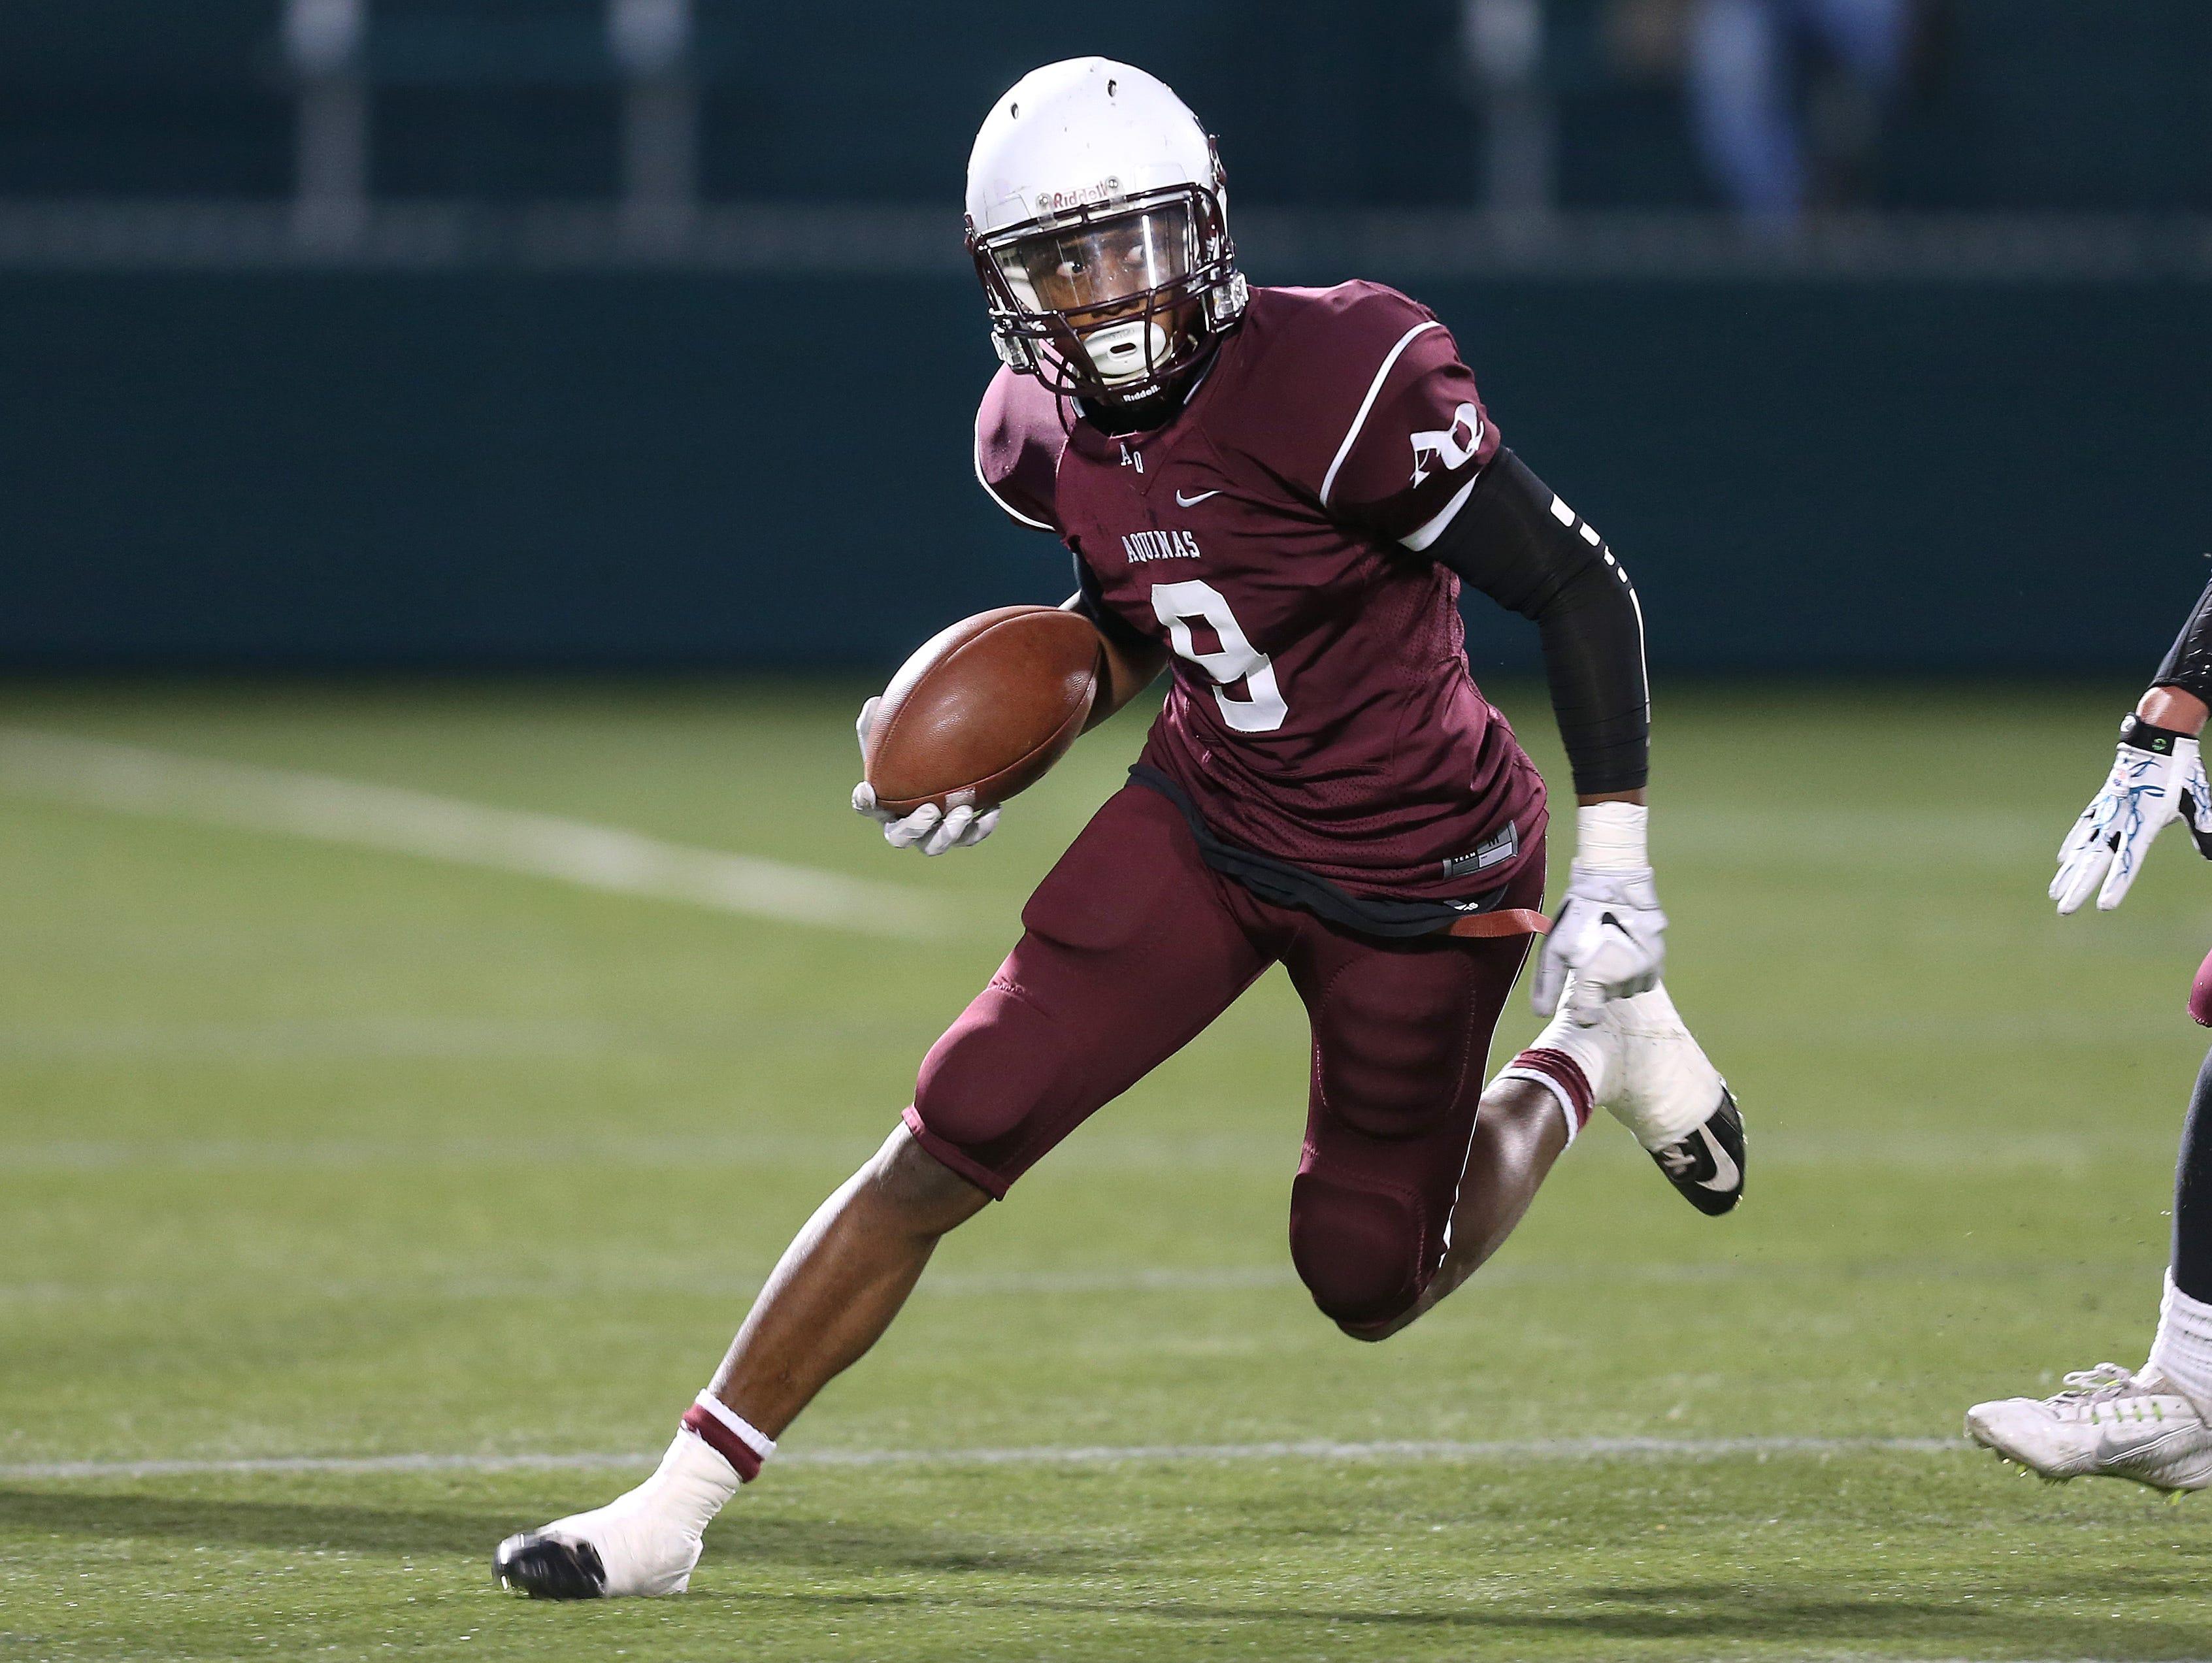 Wide receiver Earnest Edwards - Class of 2016